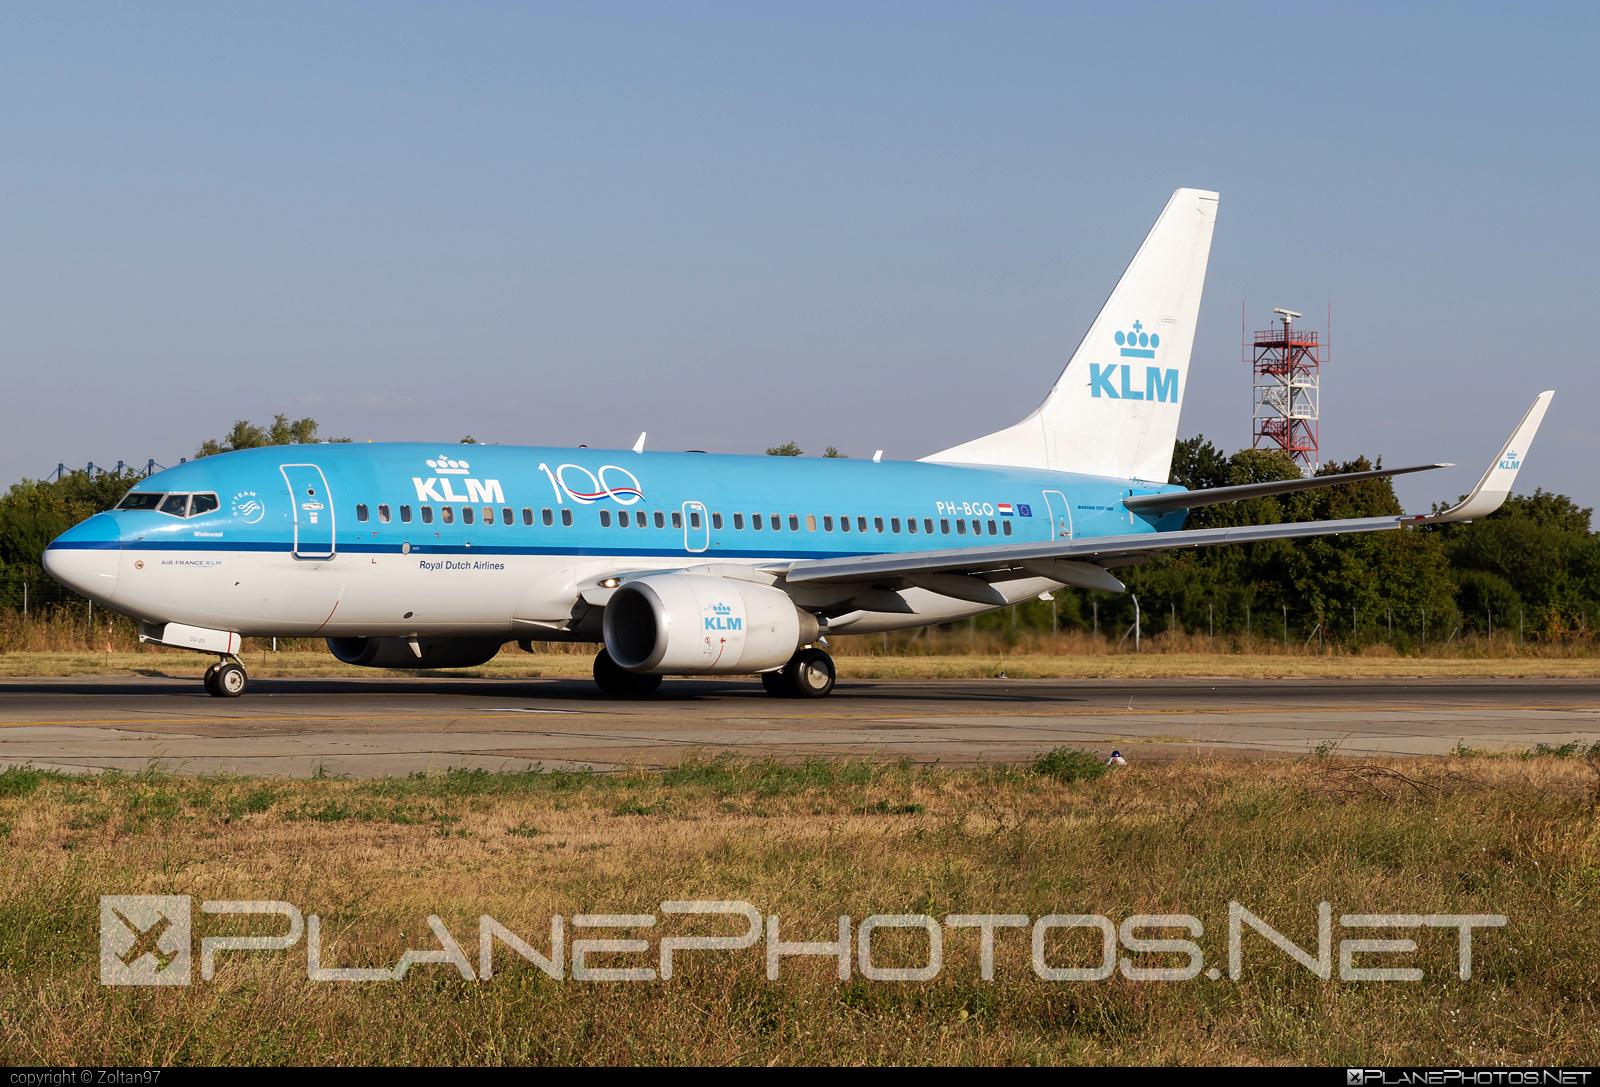 Boeing 737-700 - PH-BGQ operated by KLM Royal Dutch Airlines #b737 #b737nextgen #b737ng #boeing #boeing737 #klm #klmroyaldutchairlines #royaldutchairlines